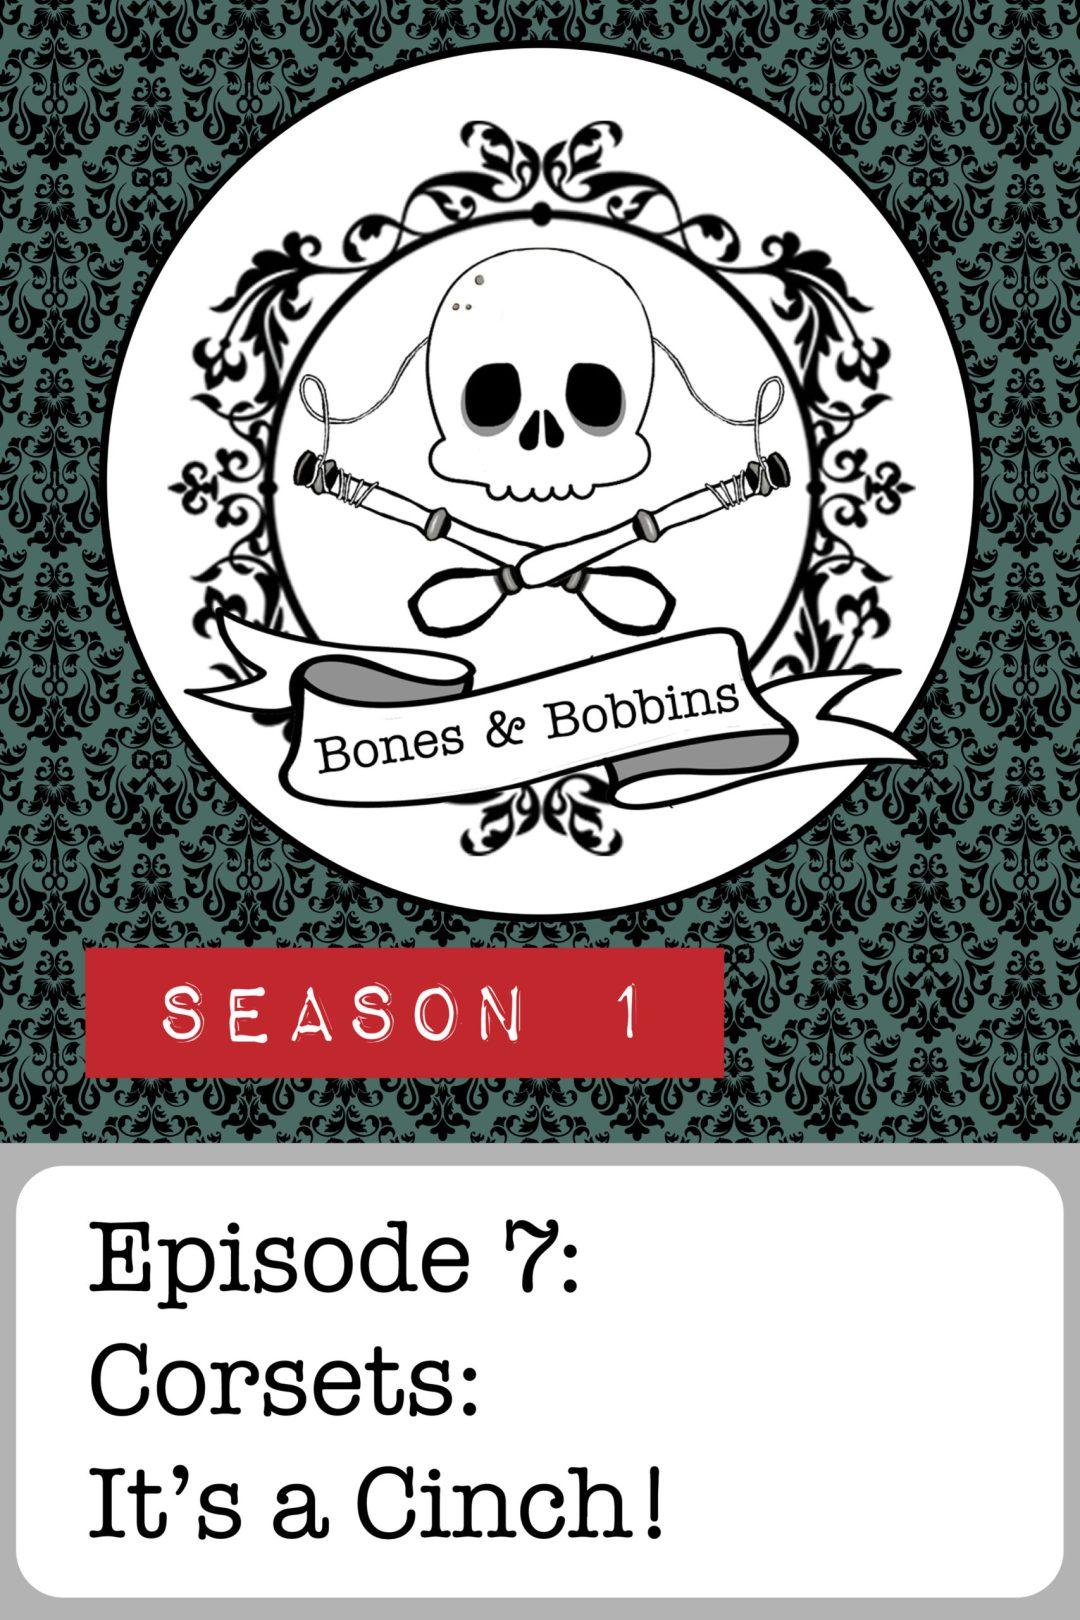 The Bones & Bobbins Podcast, Season 1, Episode 07: Corsets: It's a Cinch!